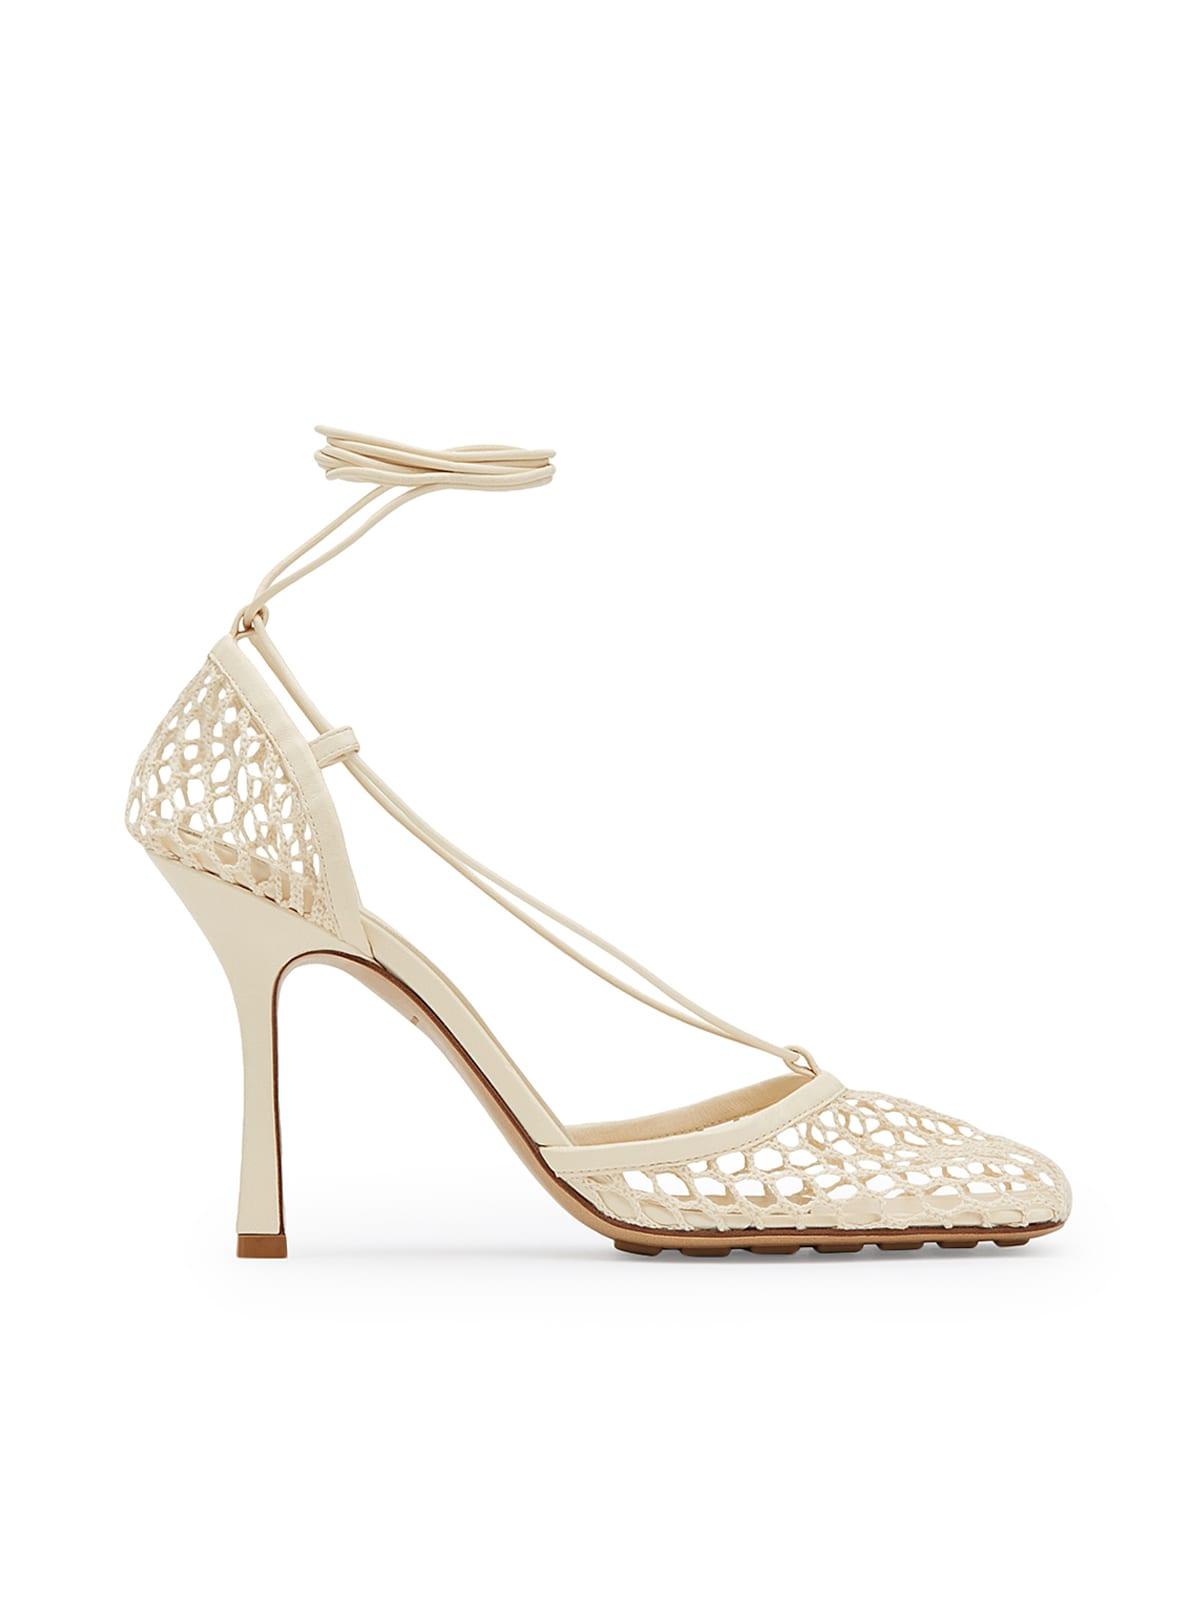 Buy Bottega Veneta Strech Sandal Fabric online, shop Bottega Veneta shoes with free shipping